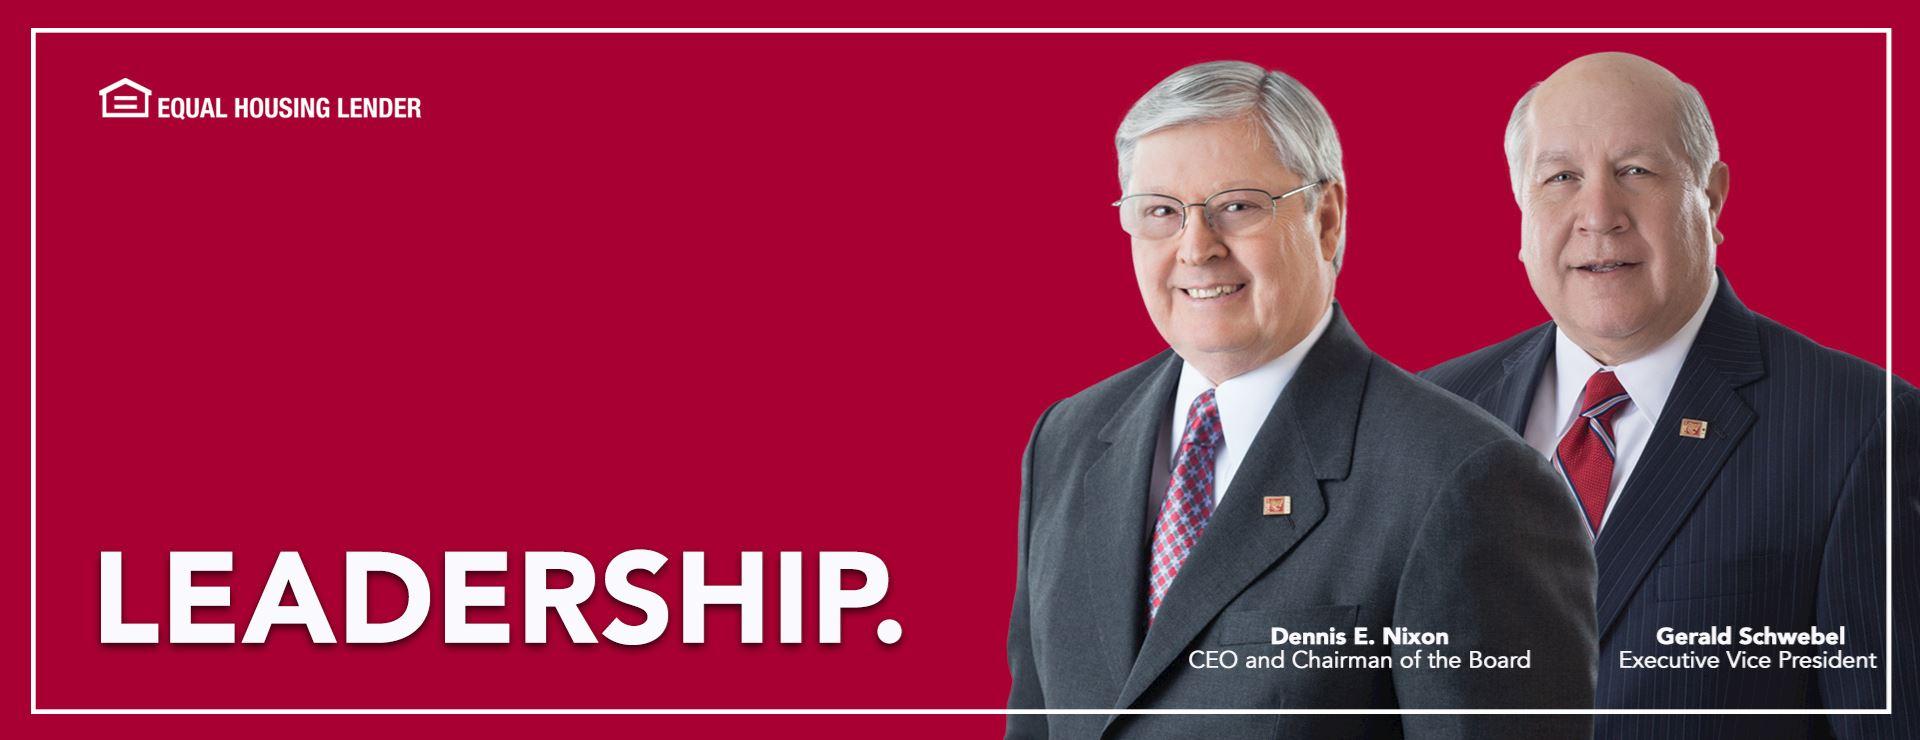 04019 - Leadership